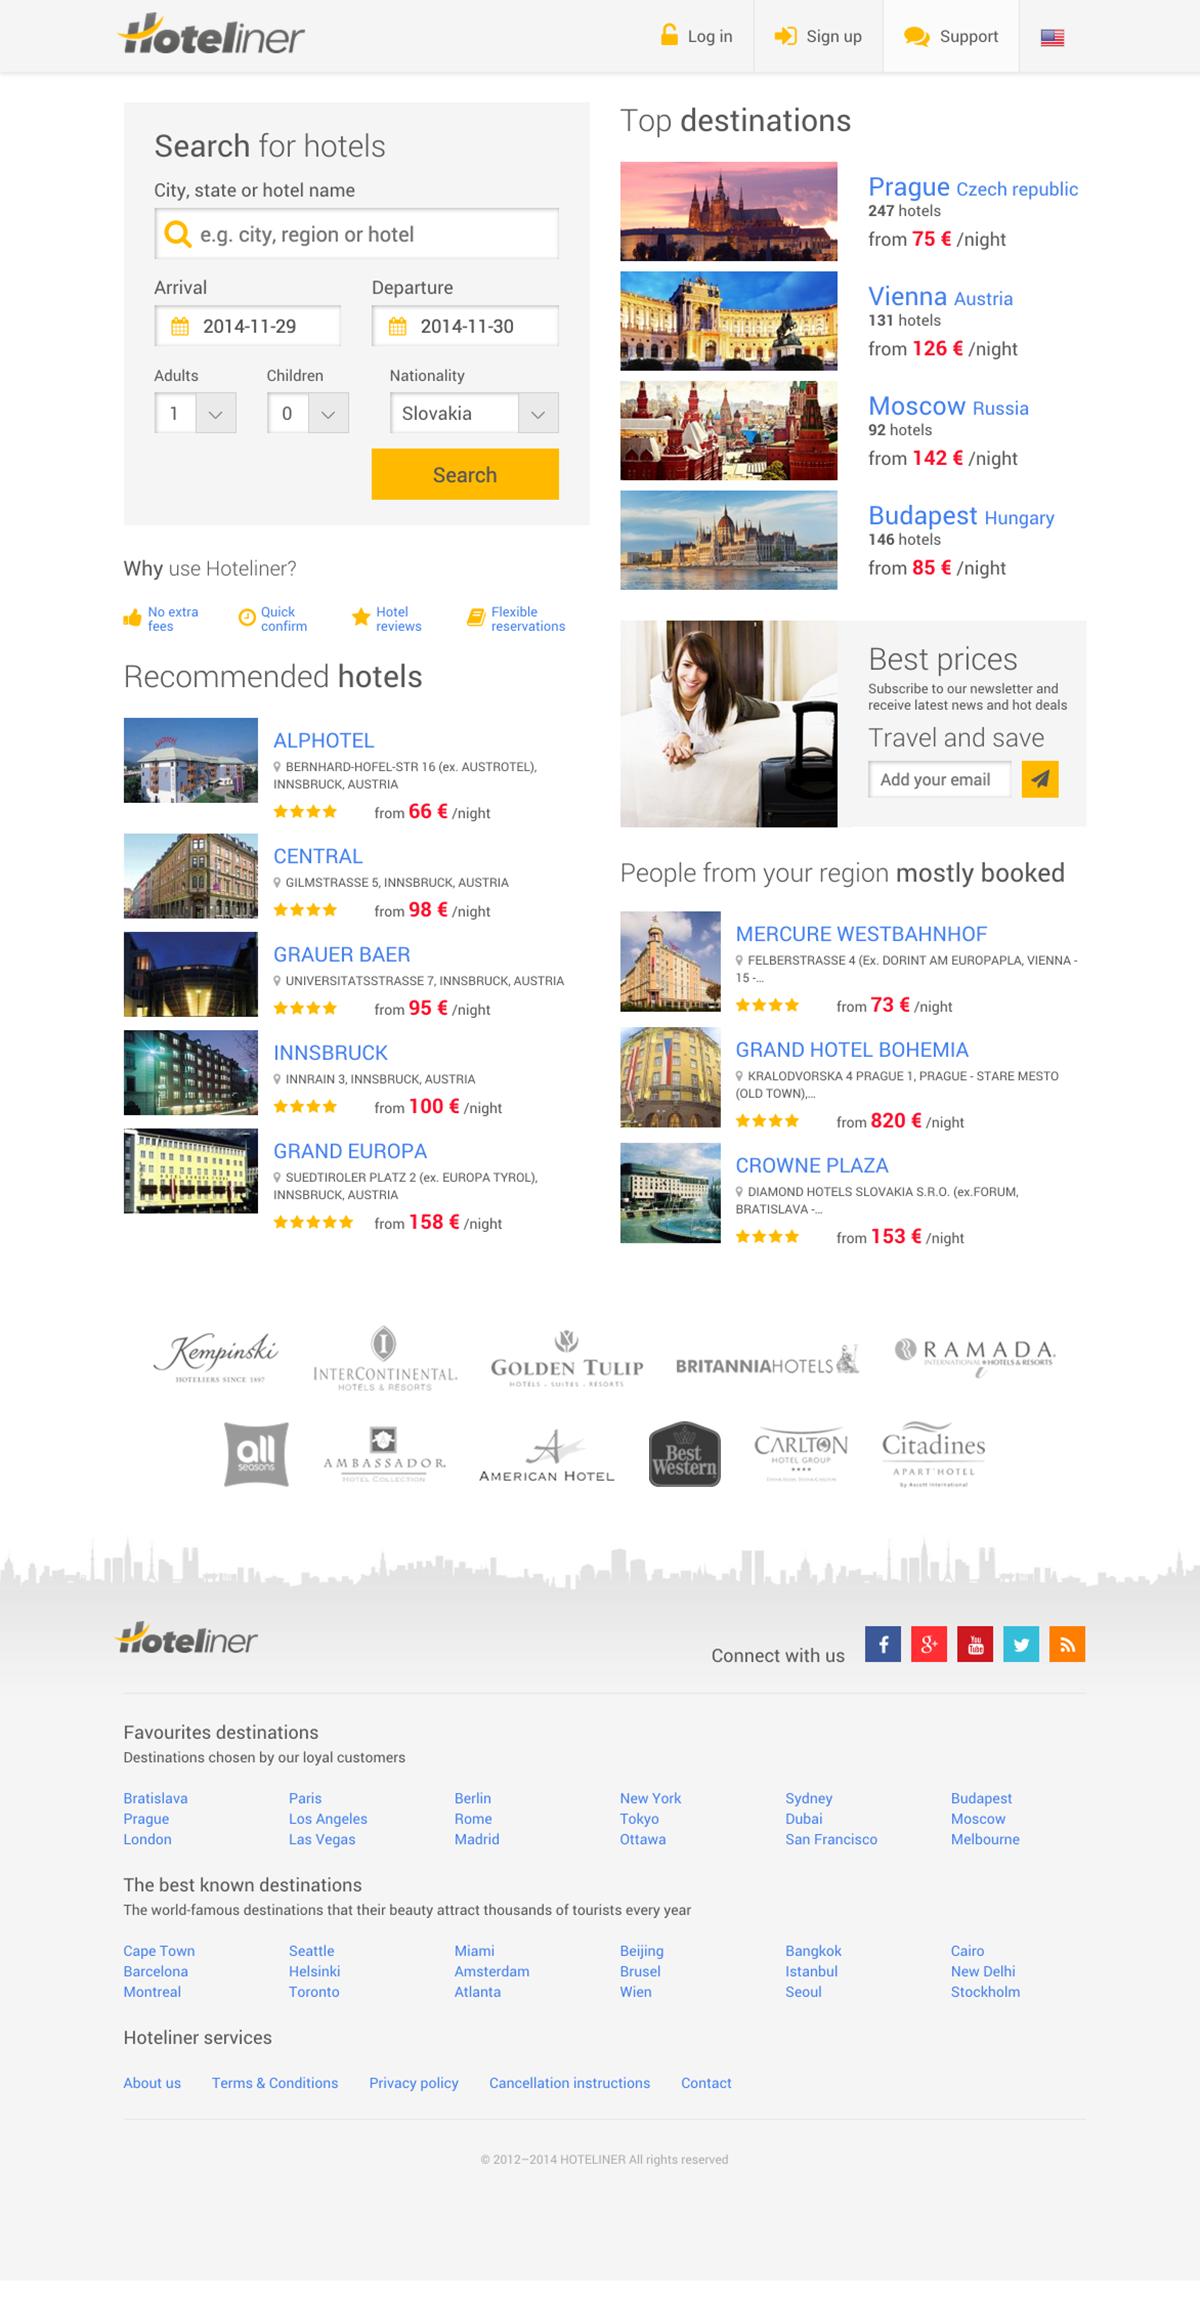 hoteliner.com